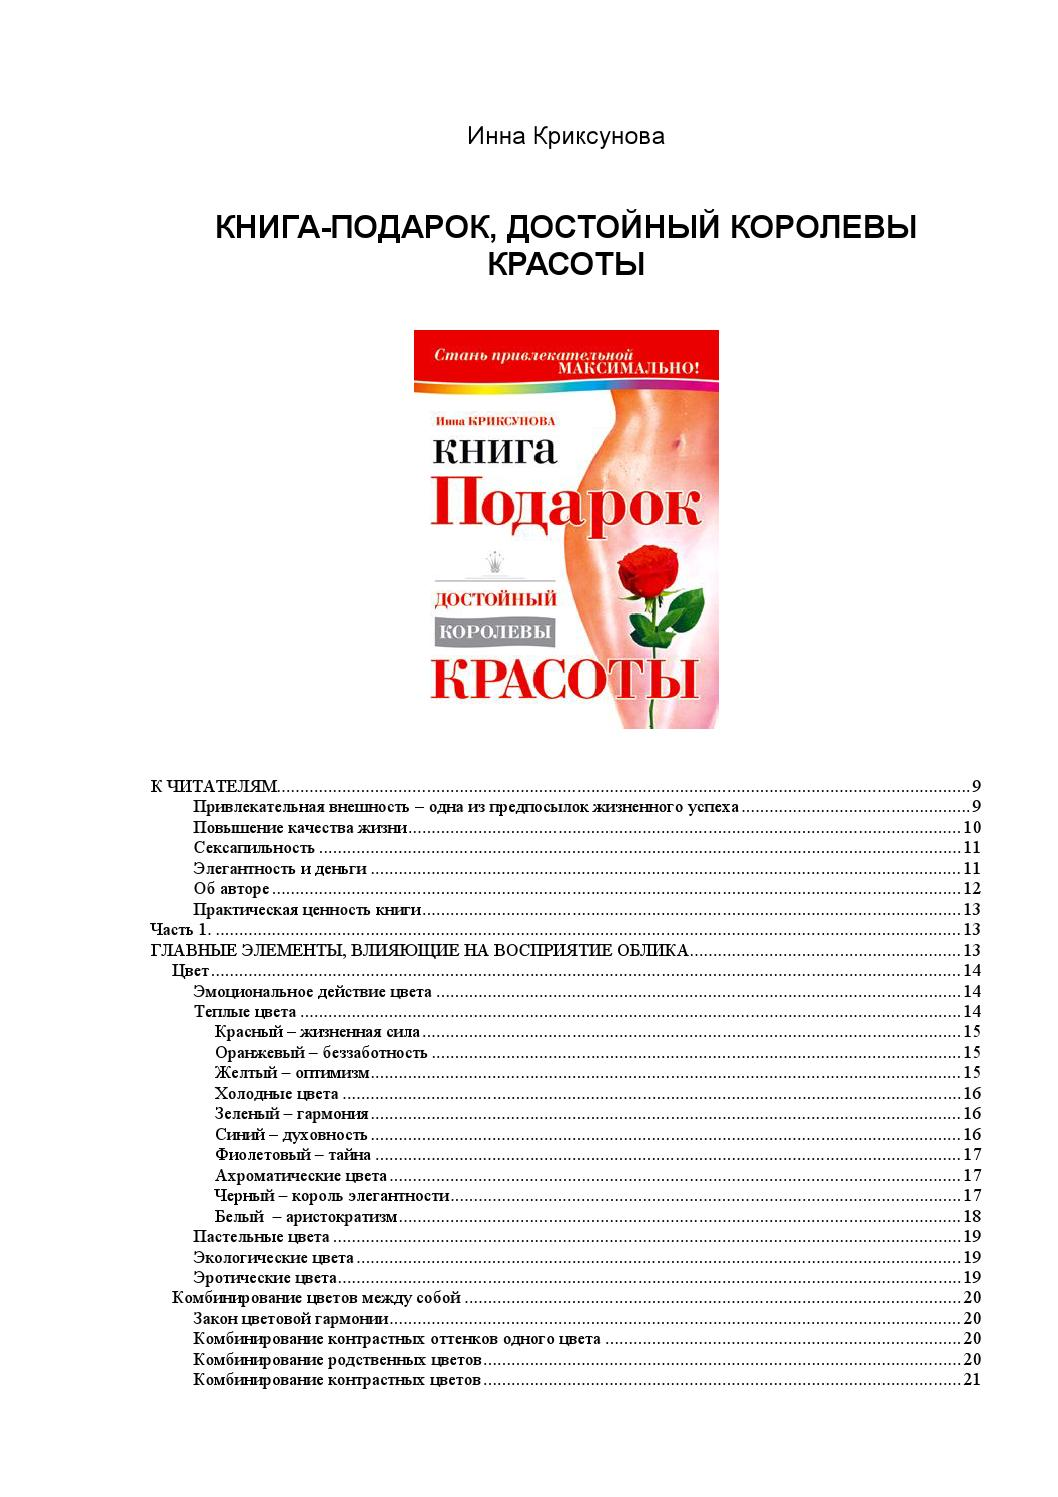 c1c3b03c3c05afa inna-kriksunova_kniga-podarok-dost-korol by Alexandr Katzyk - issuu